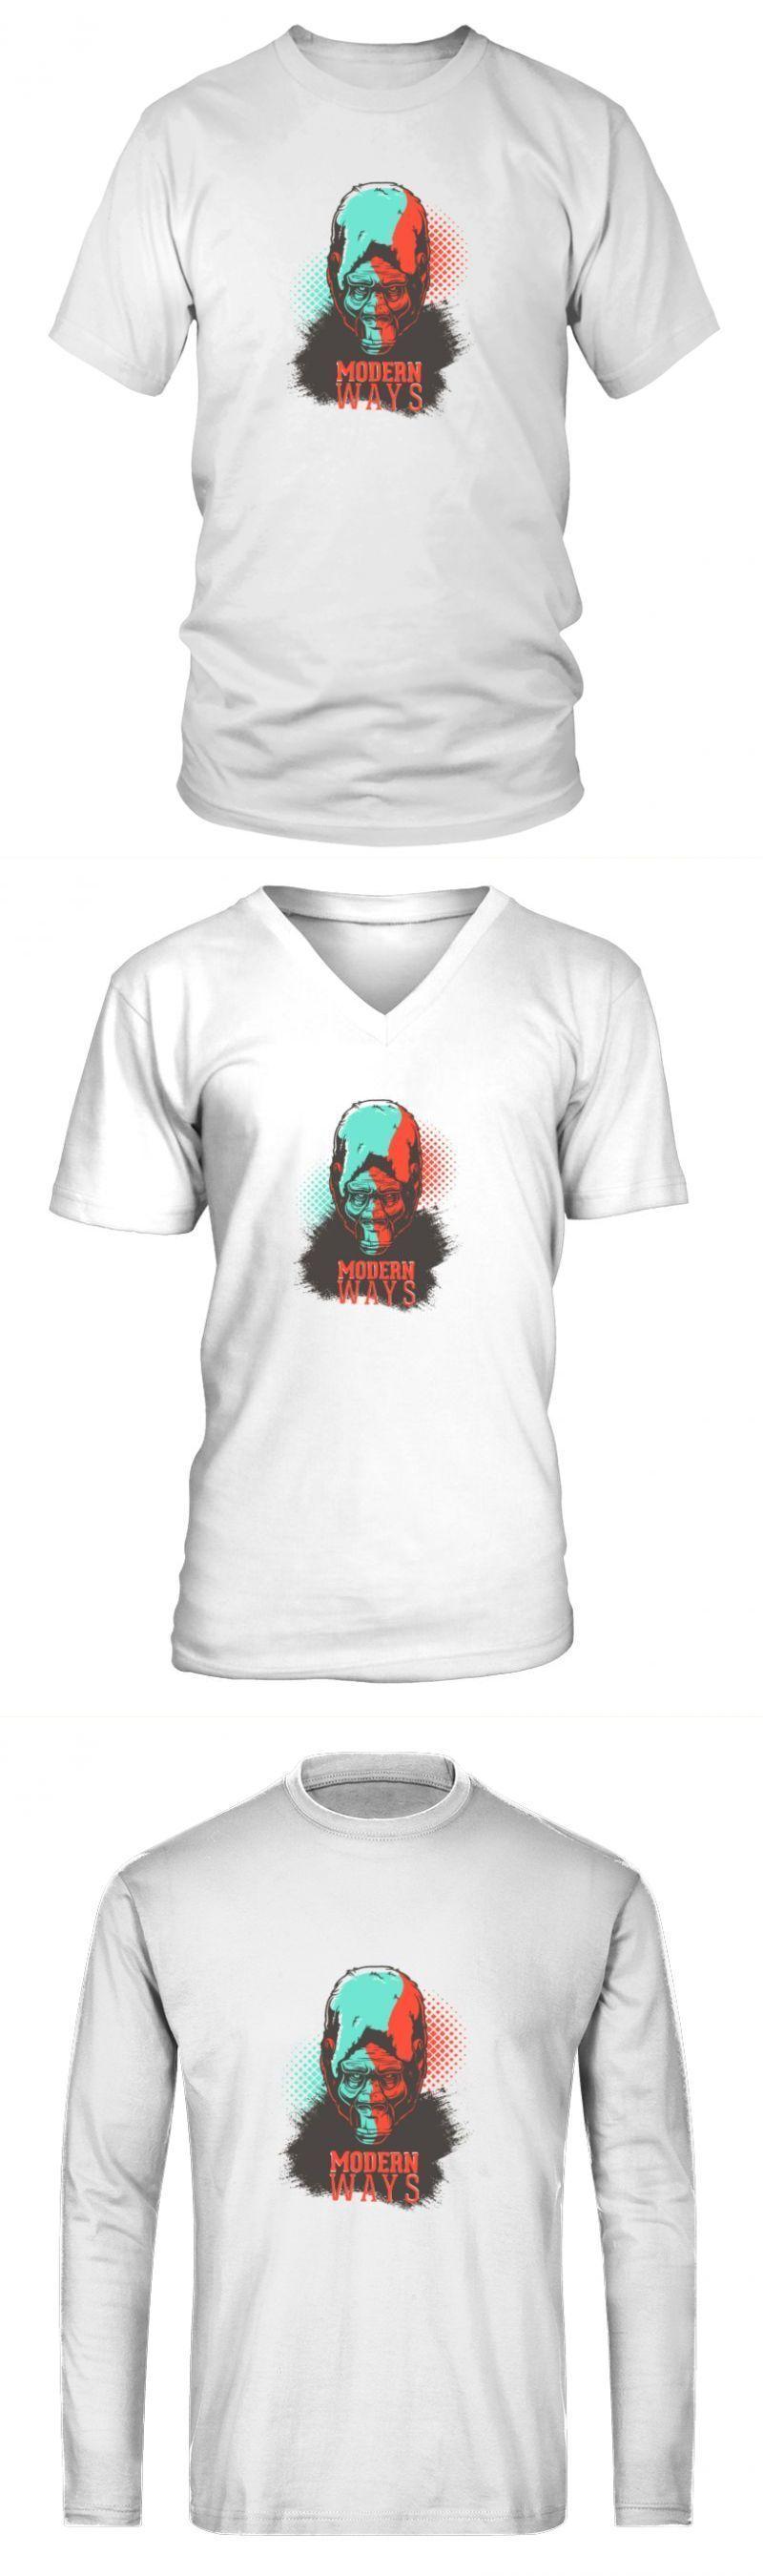 Gas monkey garage t shirt modern ways ape monkey animal evil monkey t shirt #gasmonkeygarage Gas monkey garage t shirt modern ways ape monkey animal evil monkey t shirt #gas #monkey #garage #shirt #modern #ways #ape #animal #evil #not #my #circus #monkeys #round #neck #t-shirt #unisex #v-neck #long #sleeved #gasmonkeygarage